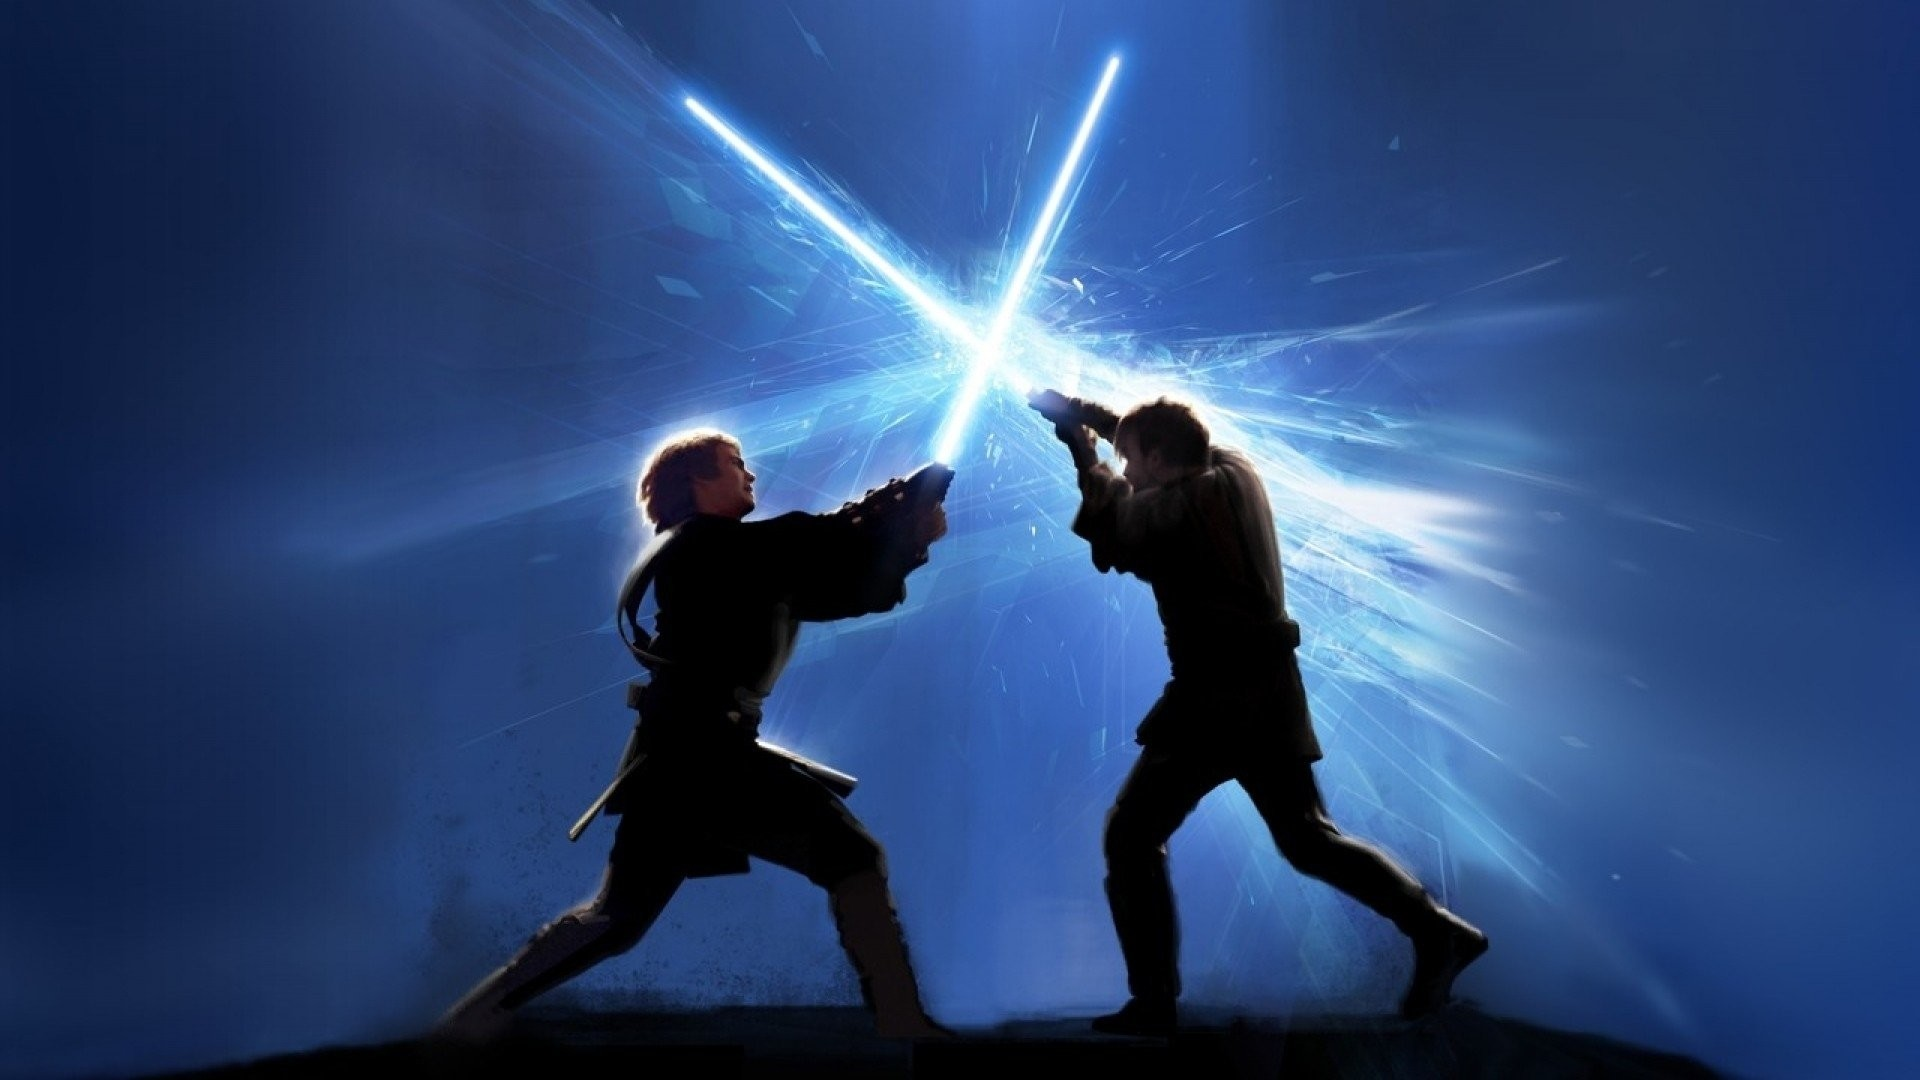 Movie – Star Wars Episode III: Revenge of the Sith Lightsaber Wallpaper